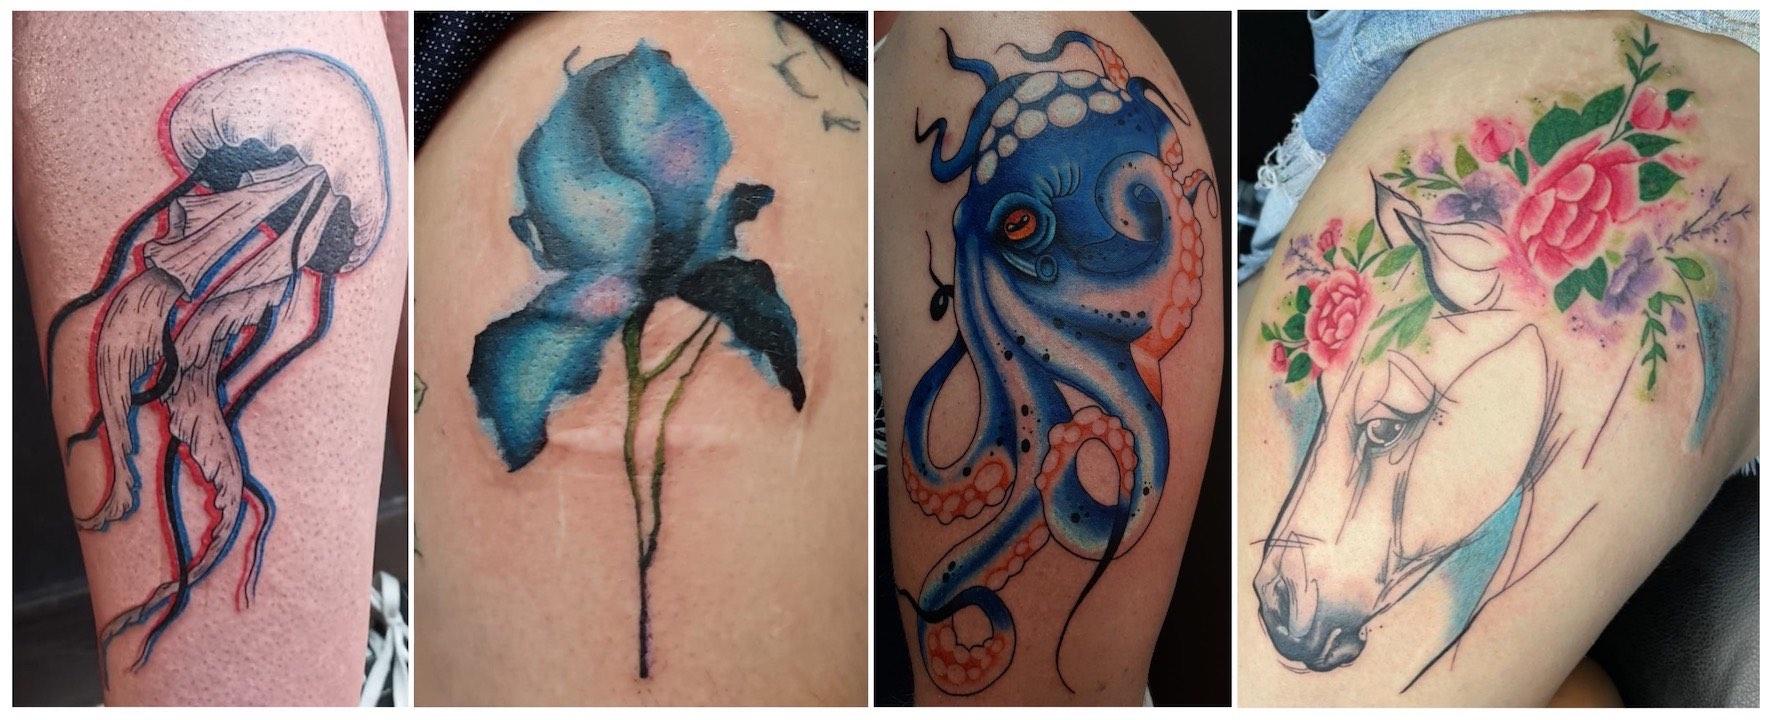 Tattoos done by Adrianne Black